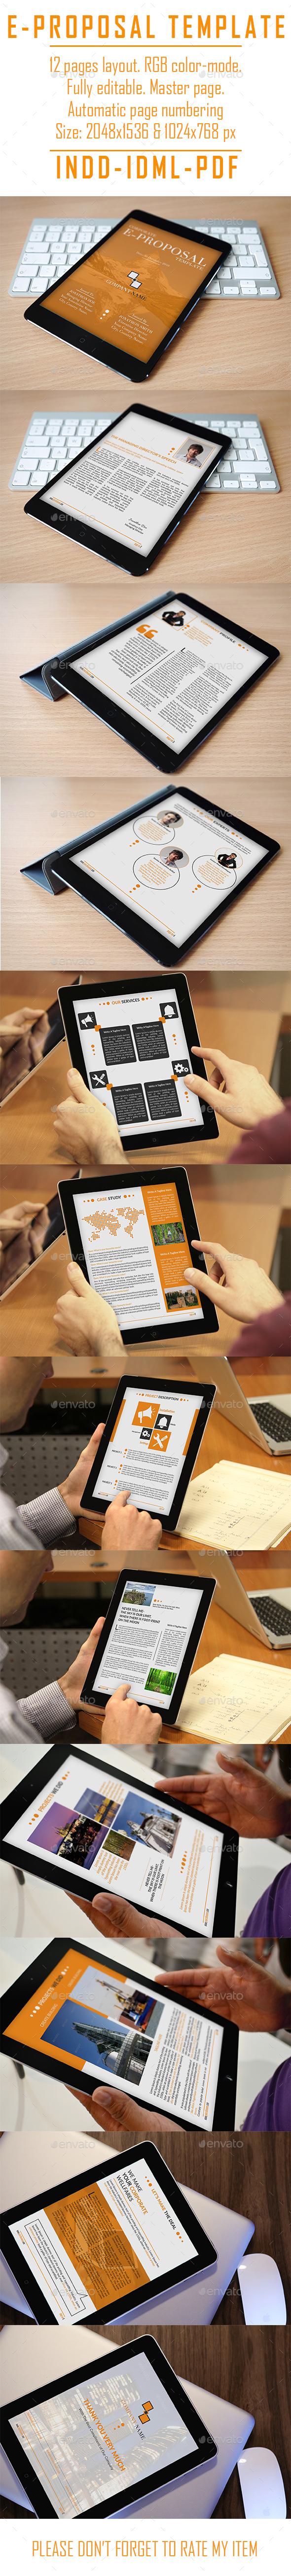 Corporate E-Proposal - ePublishing